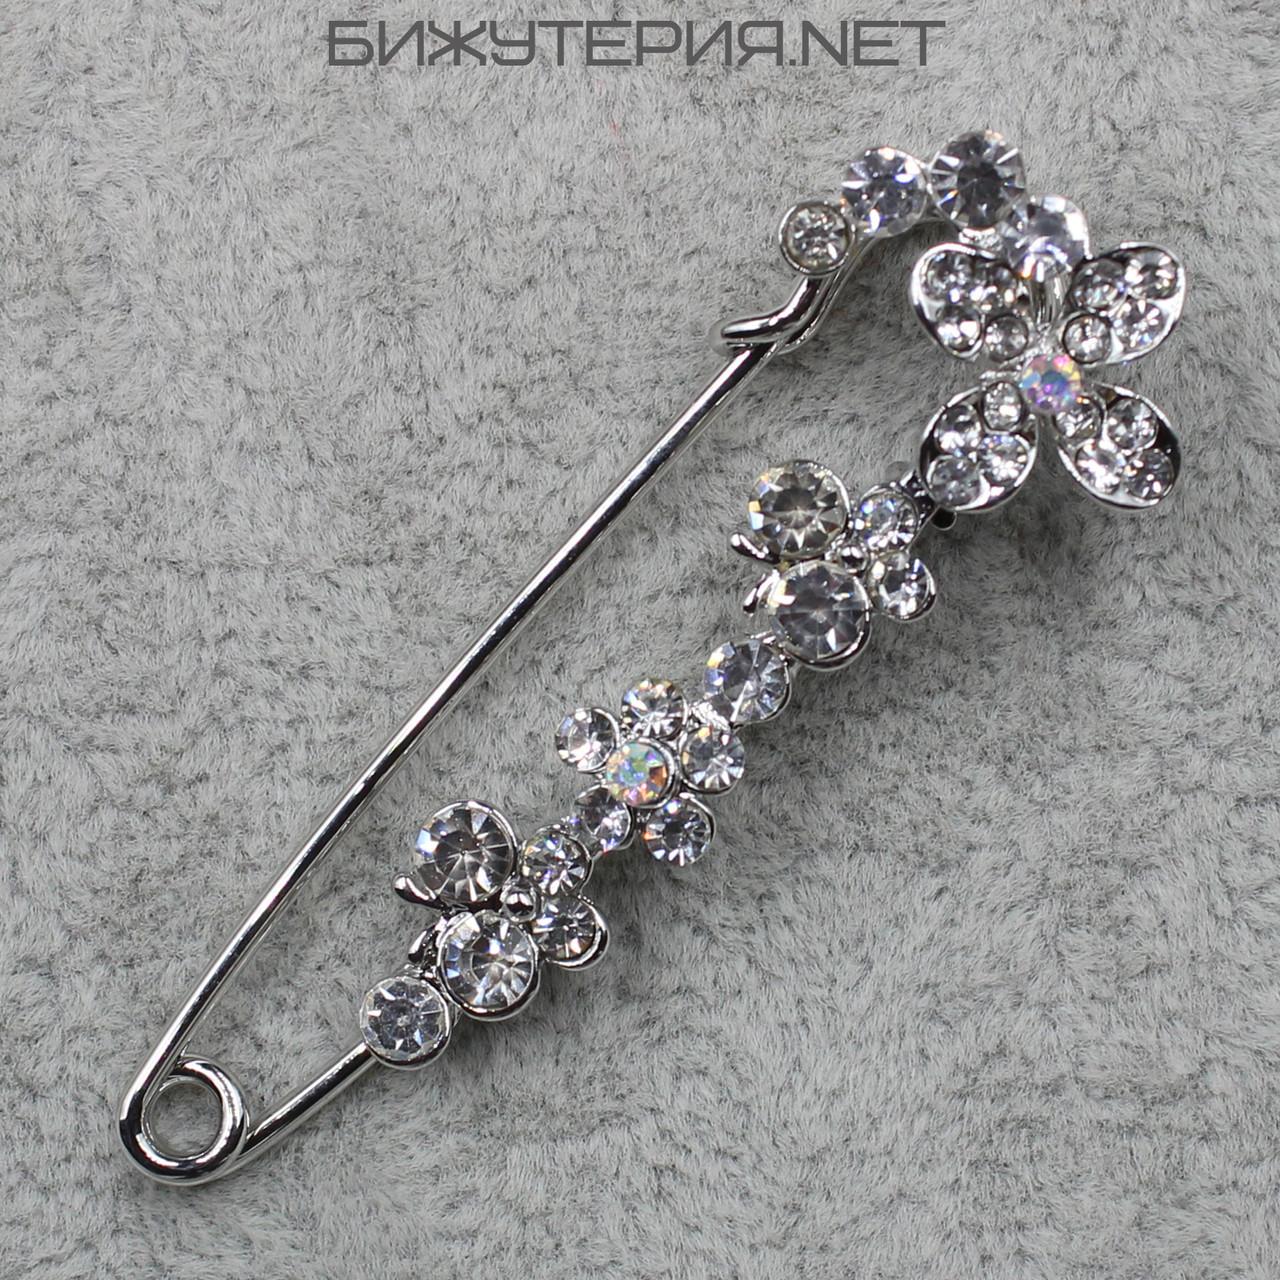 Брошь - булавка JB Цветочки, декорирована стразами белого цвета и кристаллами - 1058300578